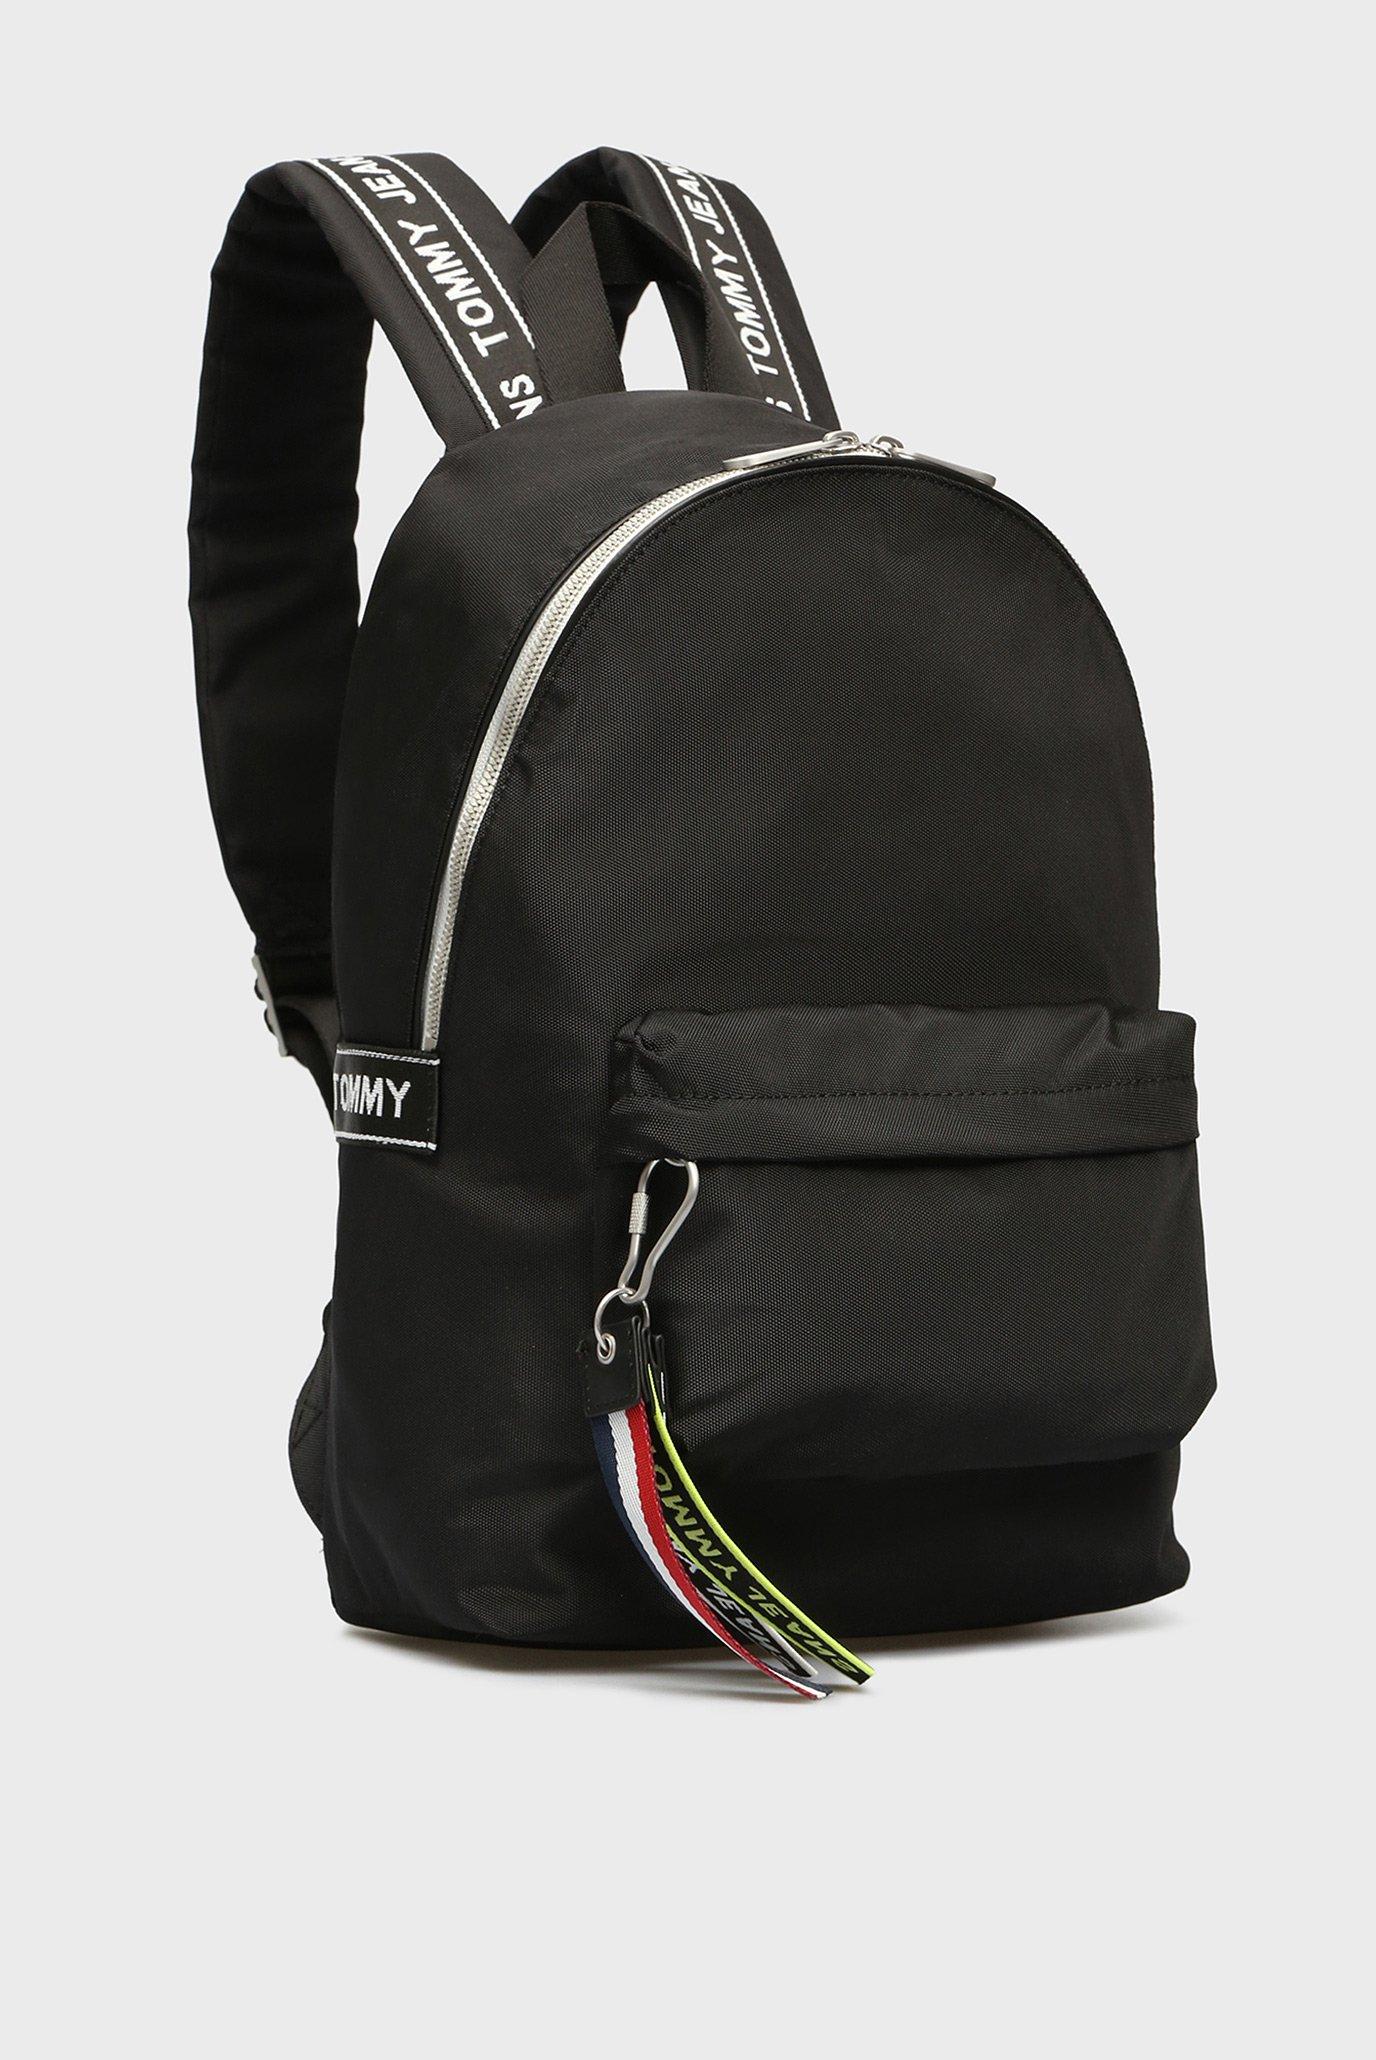 4323e91ef0a Купить Черный рюкзак TJU LOGO TAPE MED Tommy Hilfiger Tommy Hilfiger  AU0AU00400 – Киев, Украина. Цены в ...